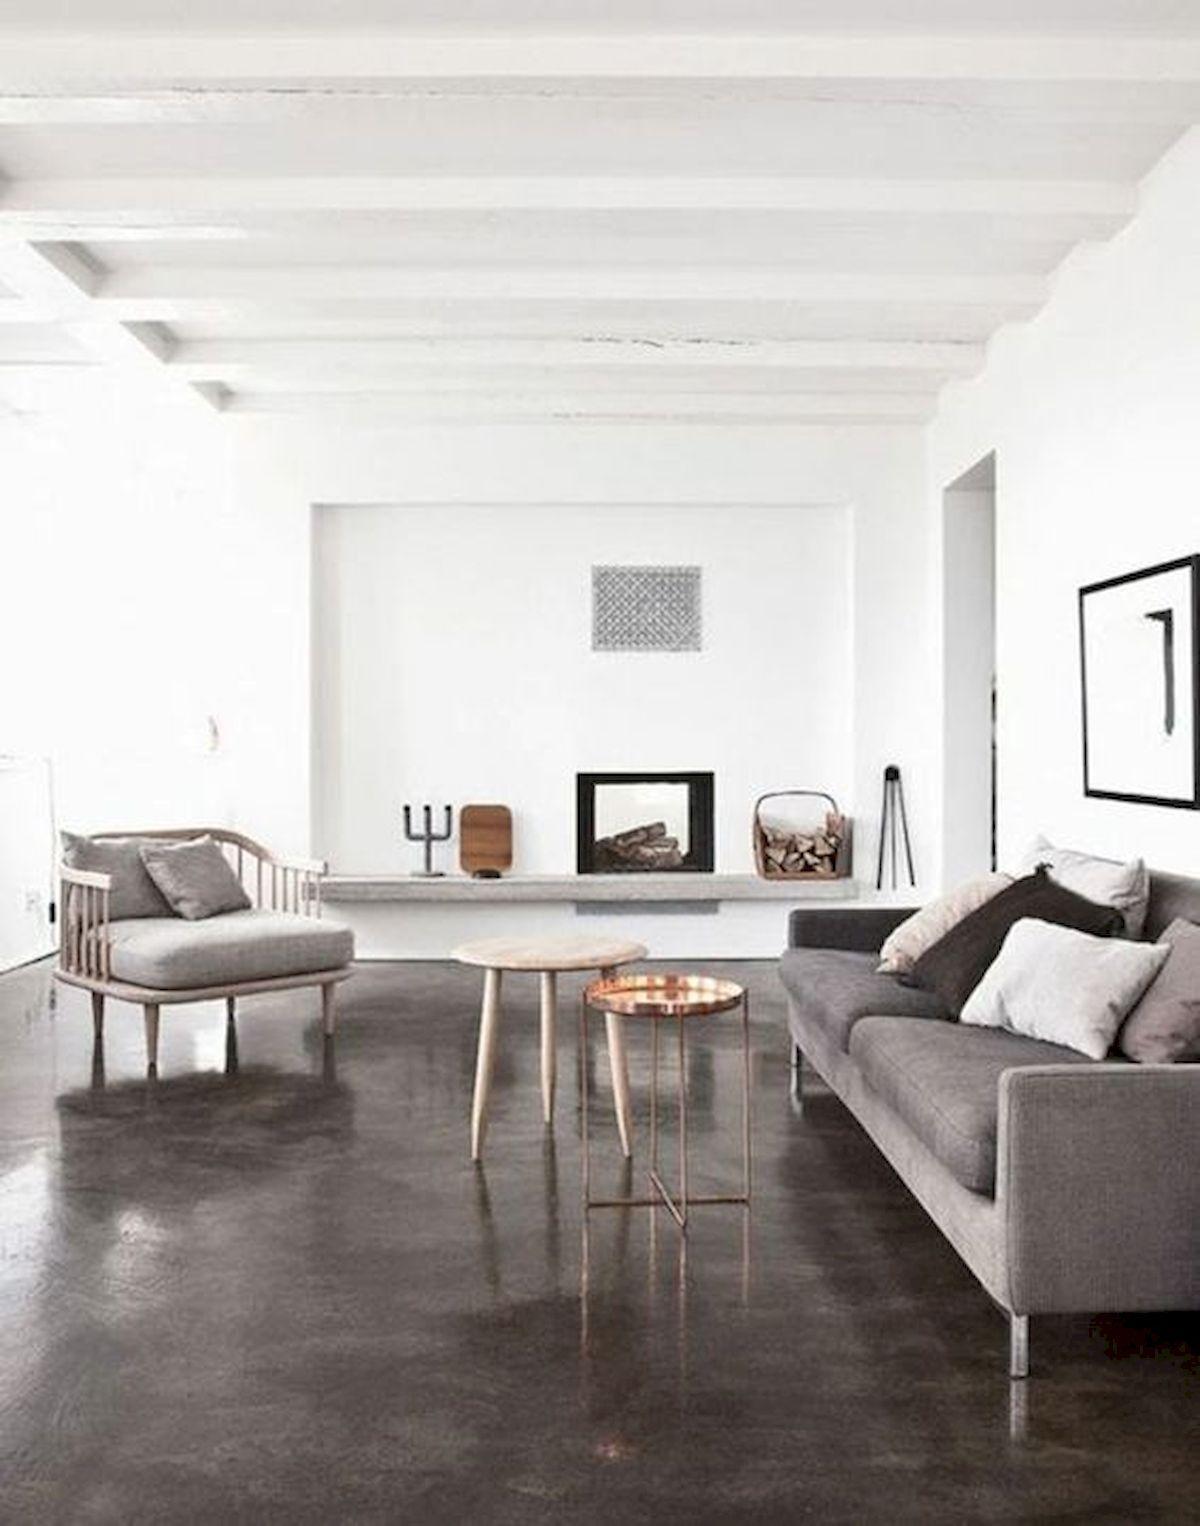 70 Smooth Concrete Floor Ideas for Interior Home